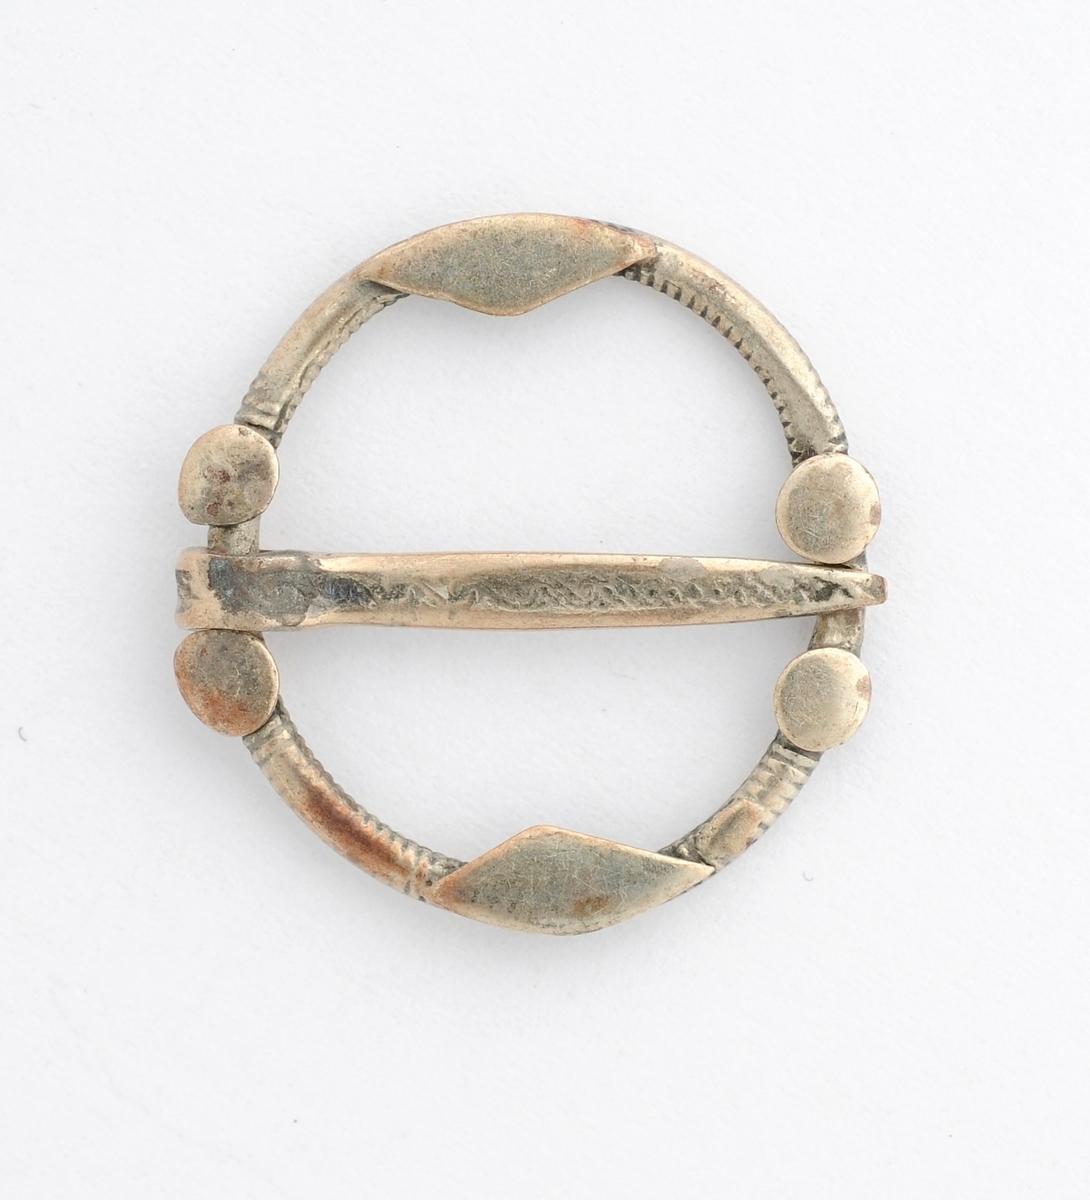 Barnesølje, Rund, støypt ring i sølv (manglar stempel). Pålodda fire små flate rundingar, og to rombe liknande plater. Laus tann.